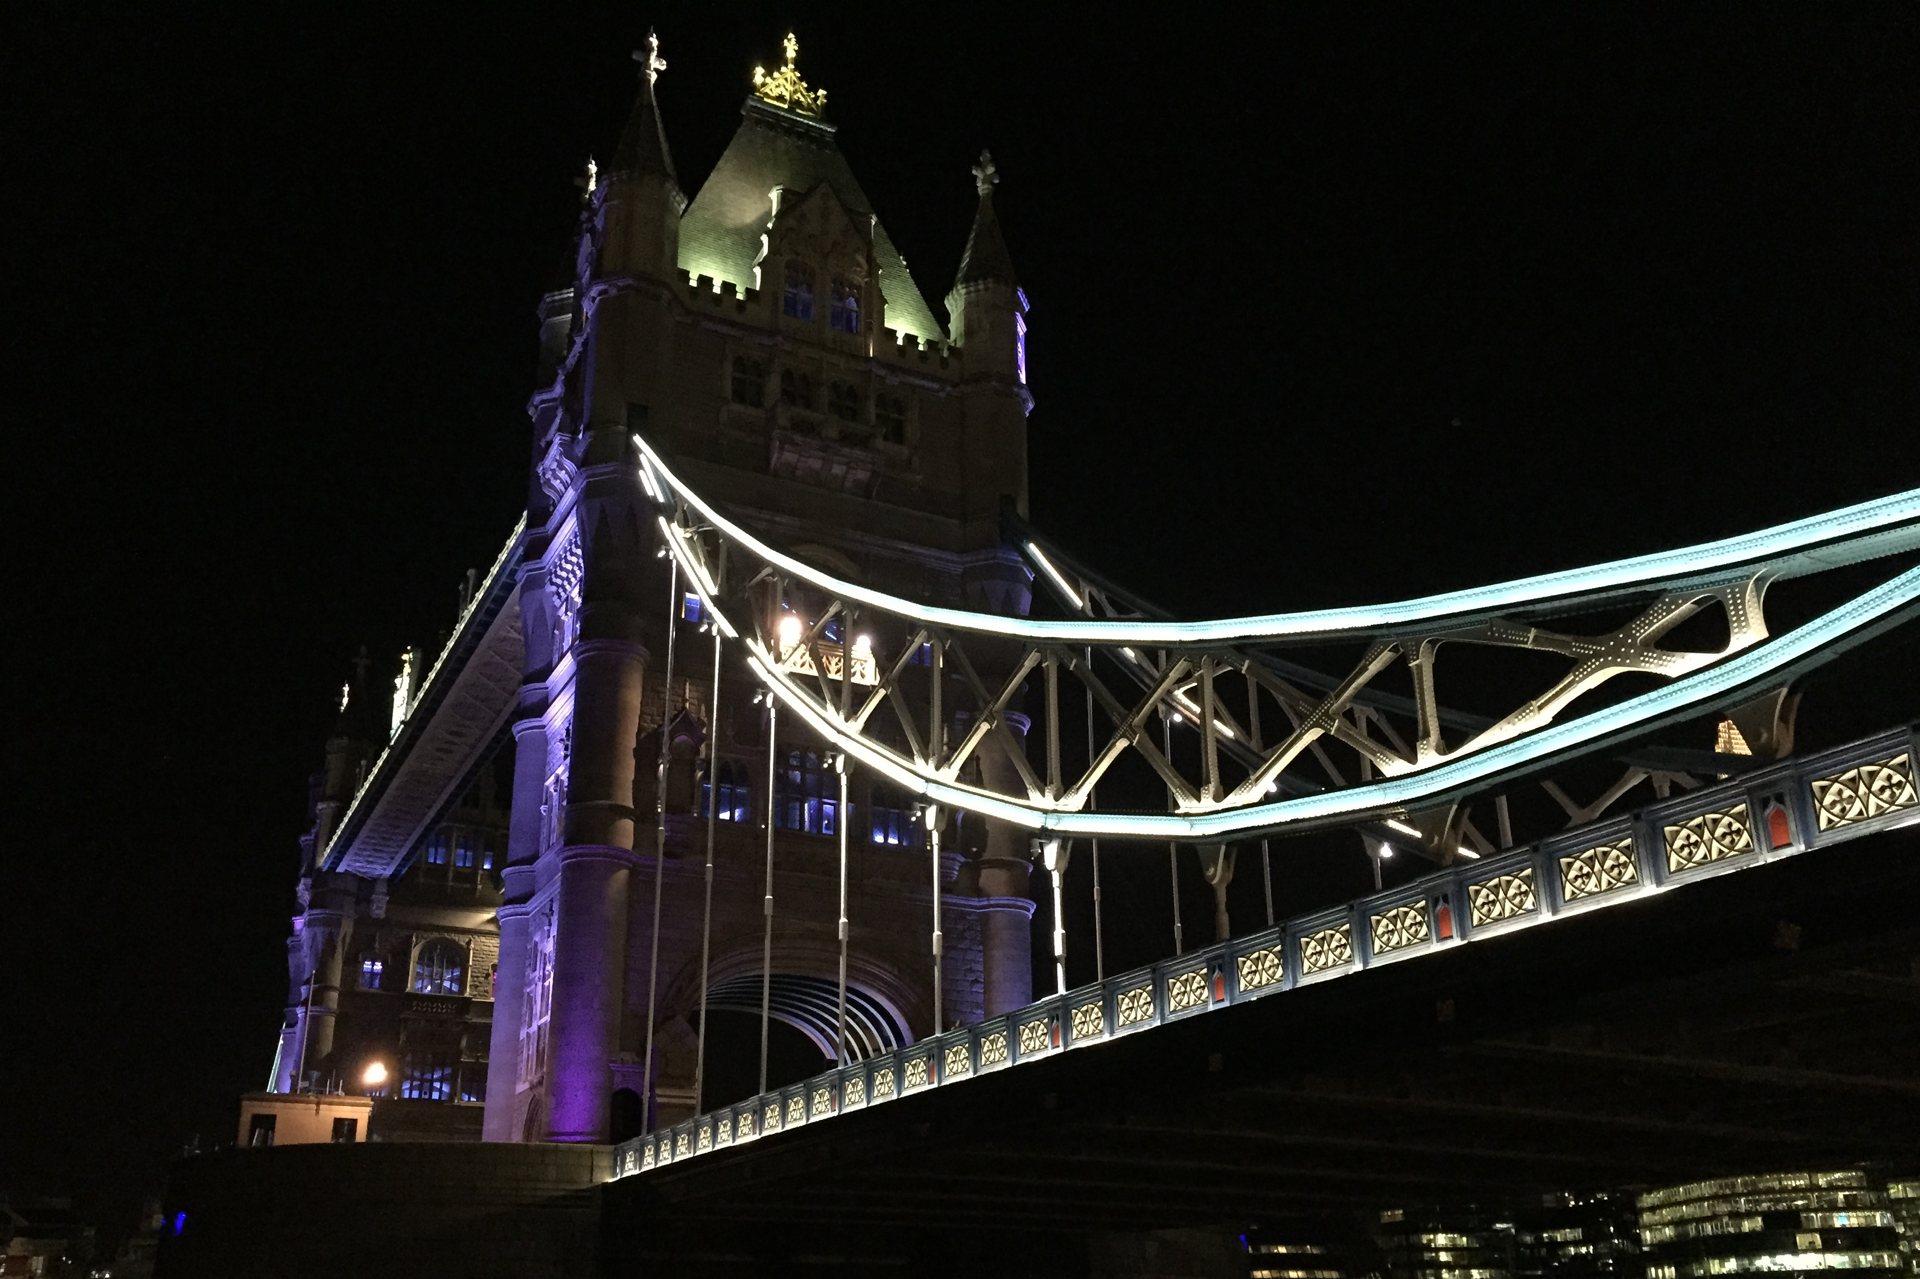 London by night - Tower Bridge close up